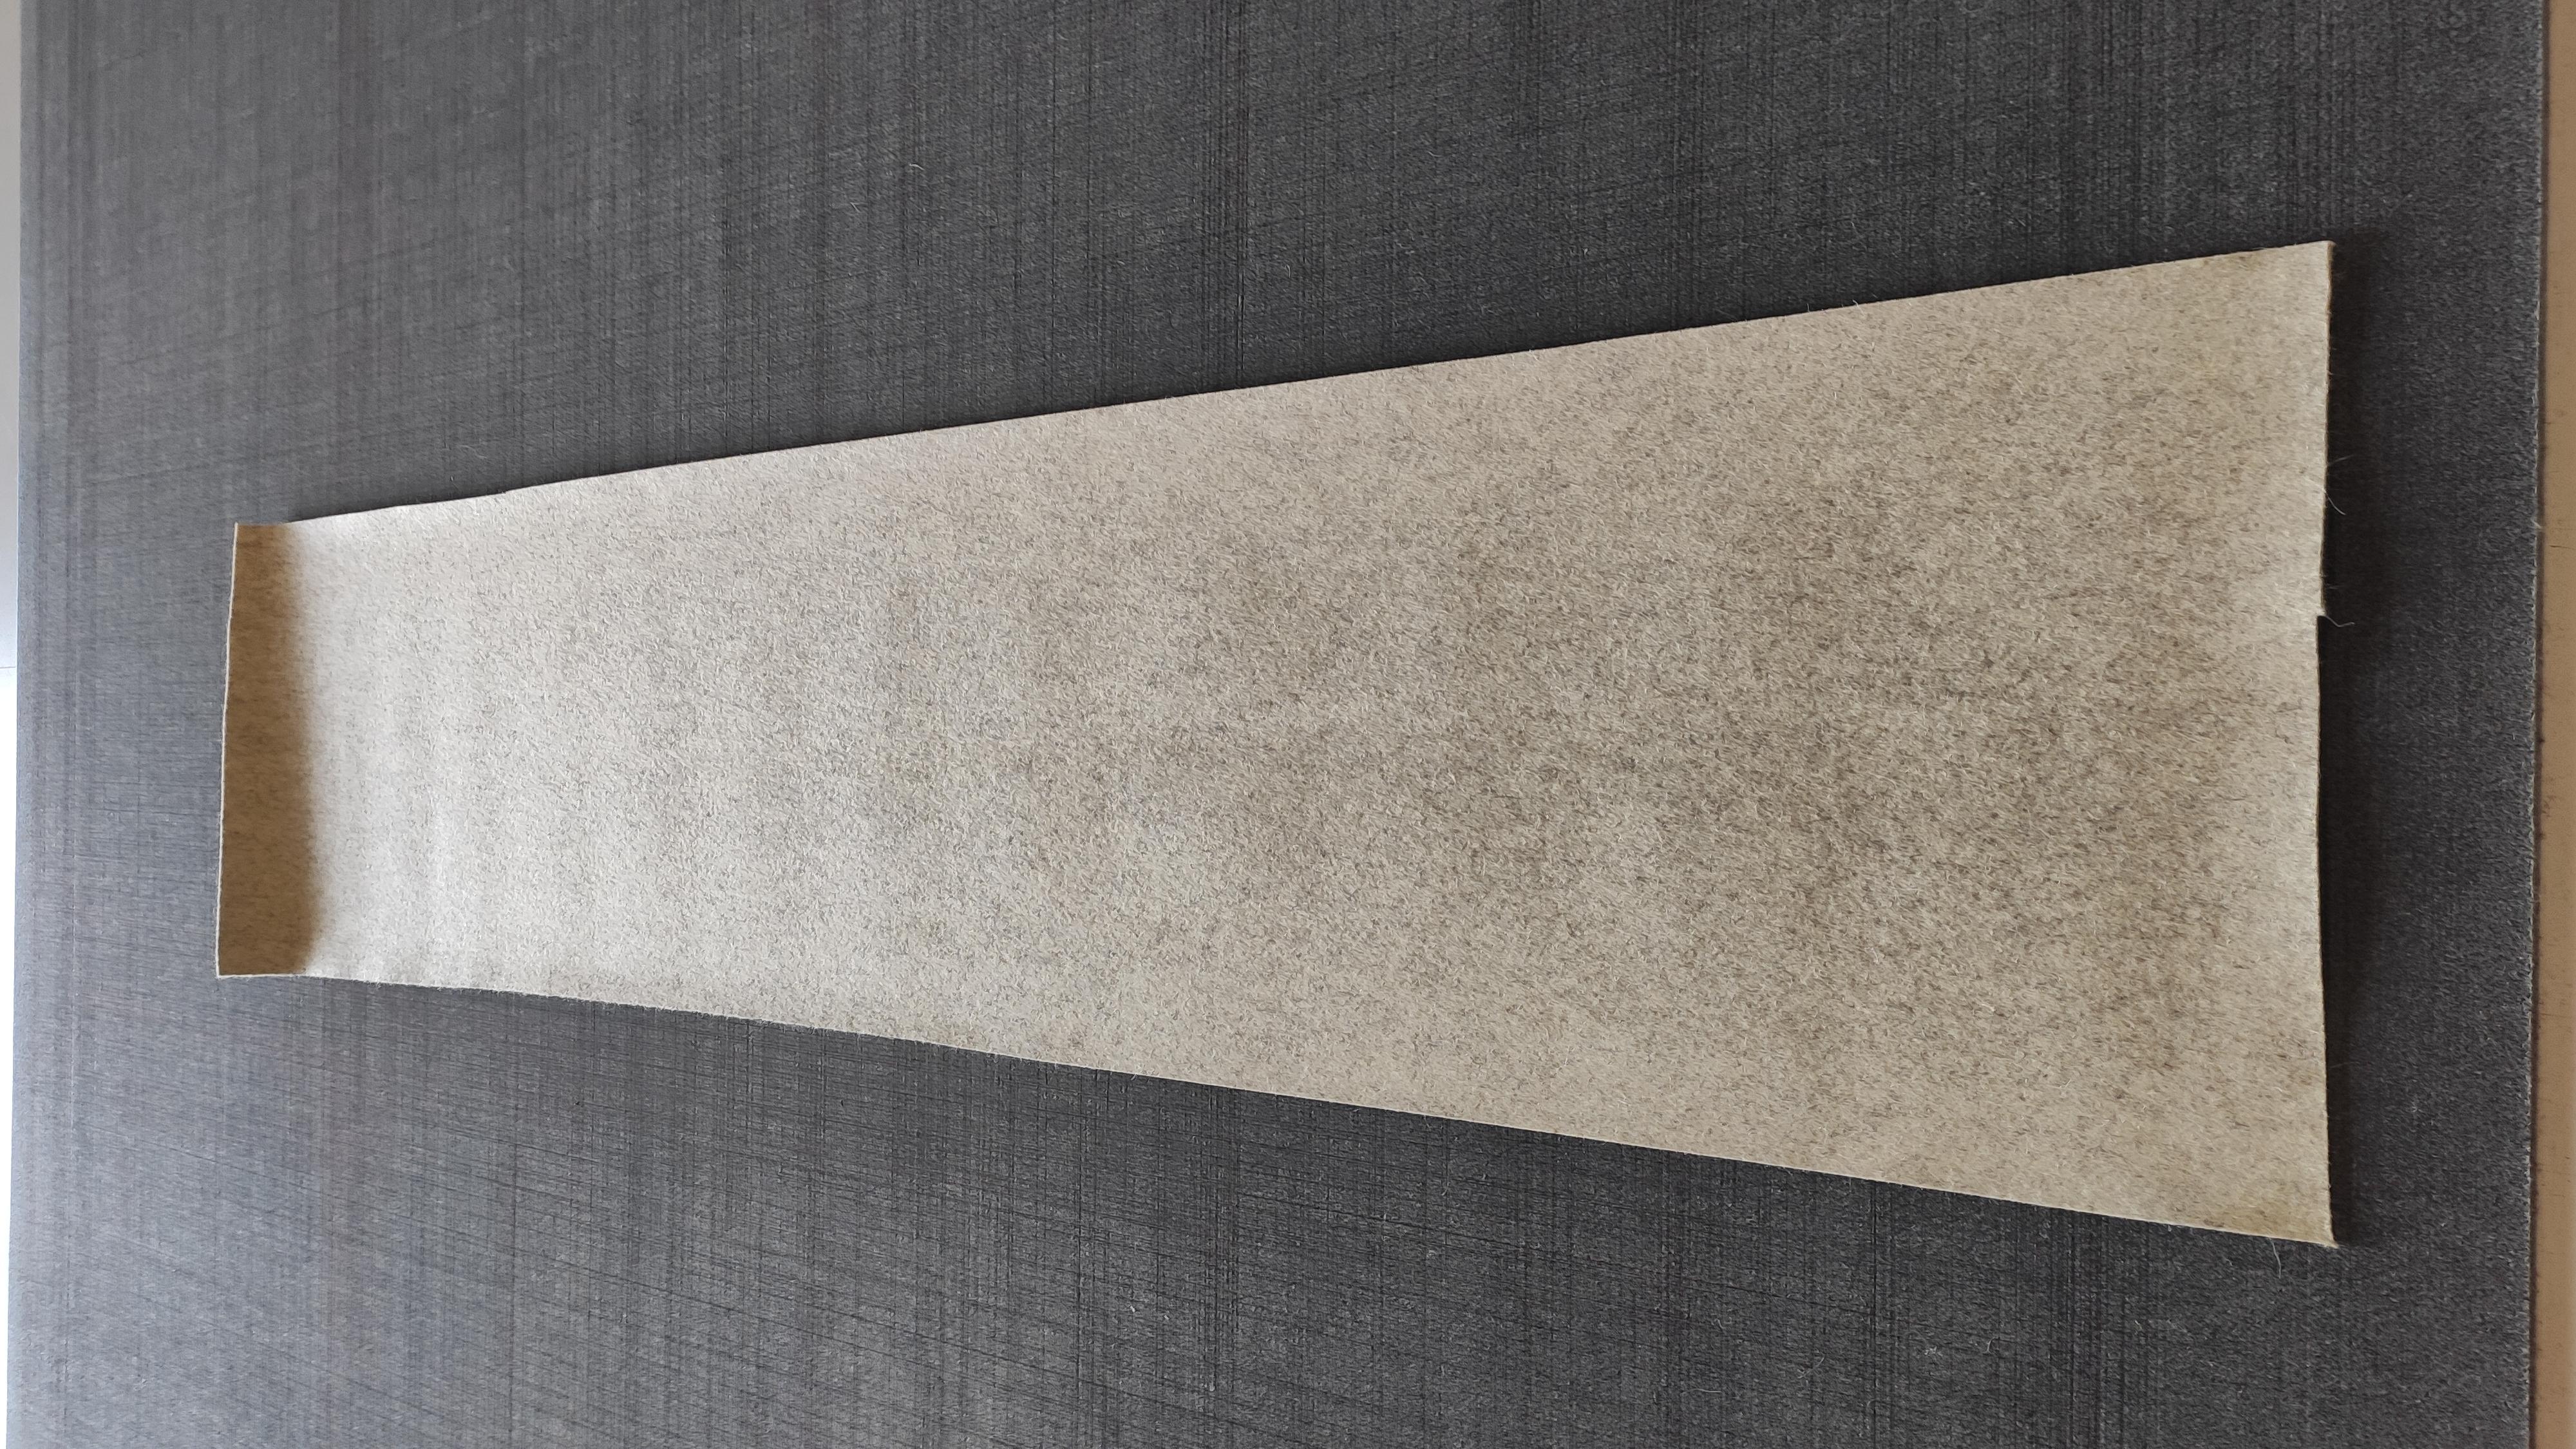 Filzrest 2 mm, beige-meliert 160, ca. 149x35 cm